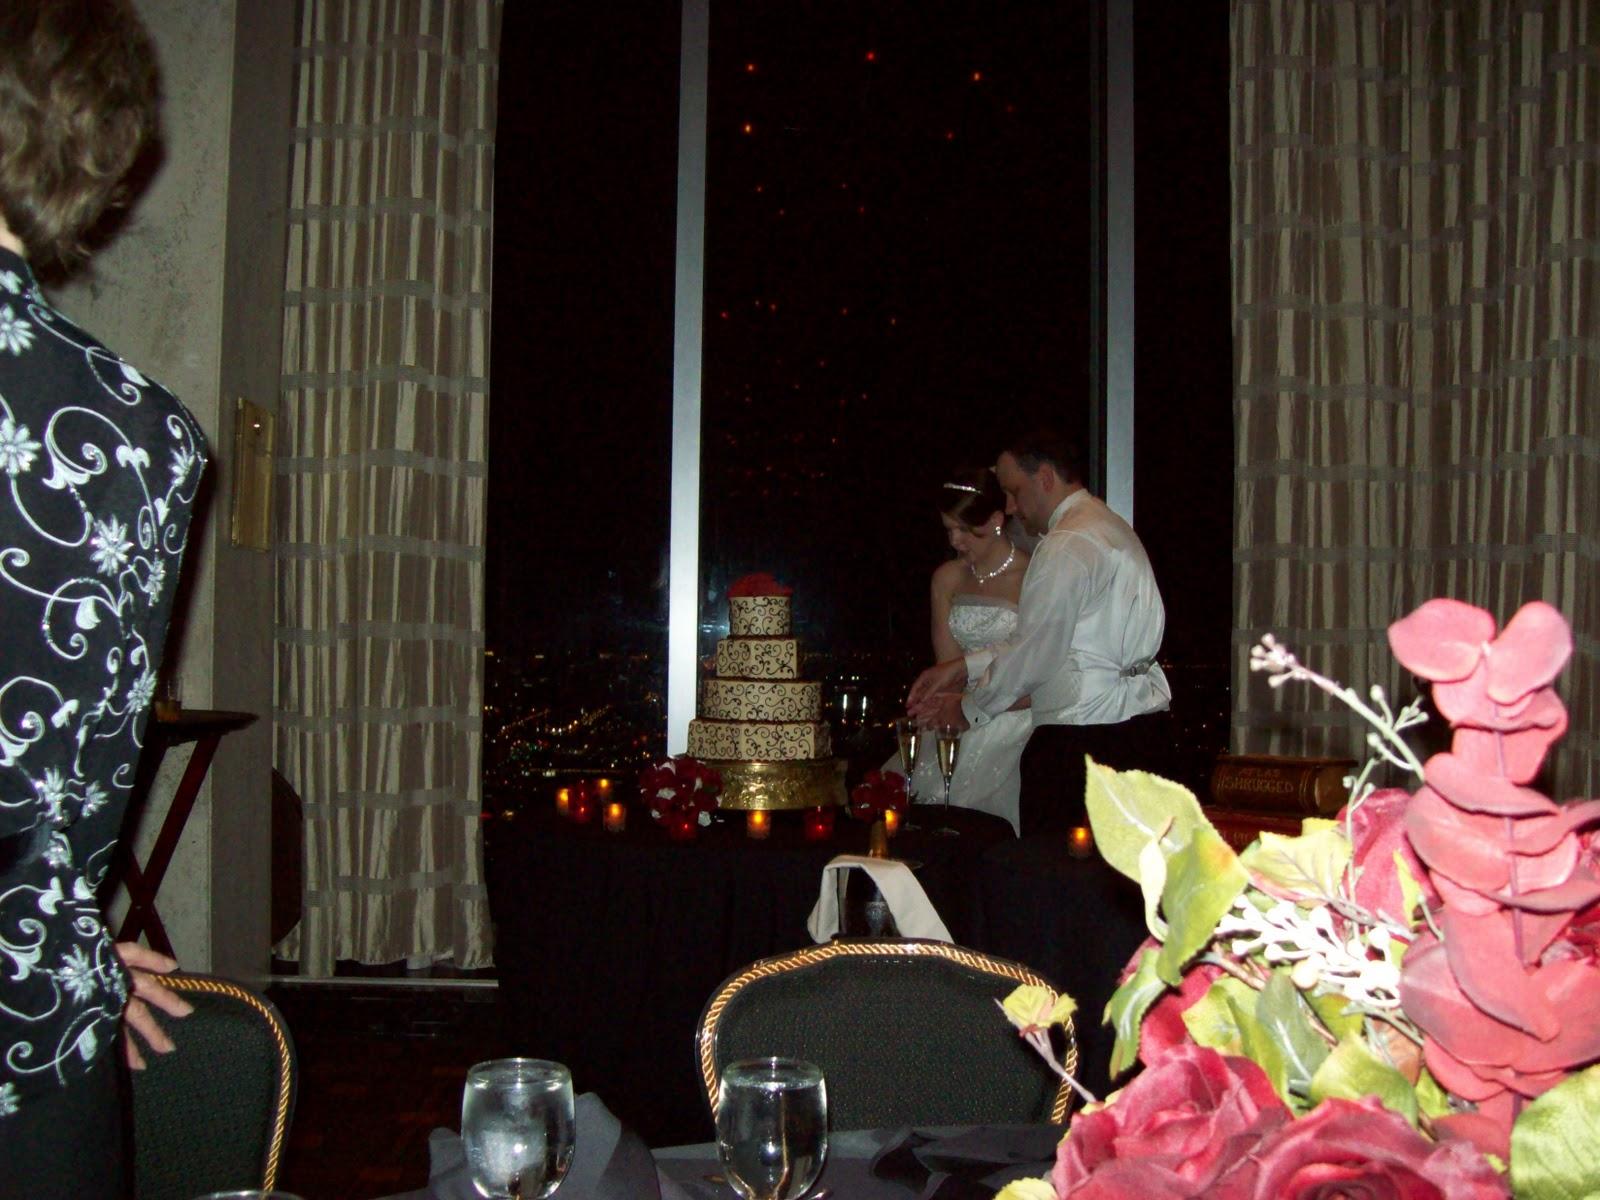 Virginias Wedding - 101_5930.JPG